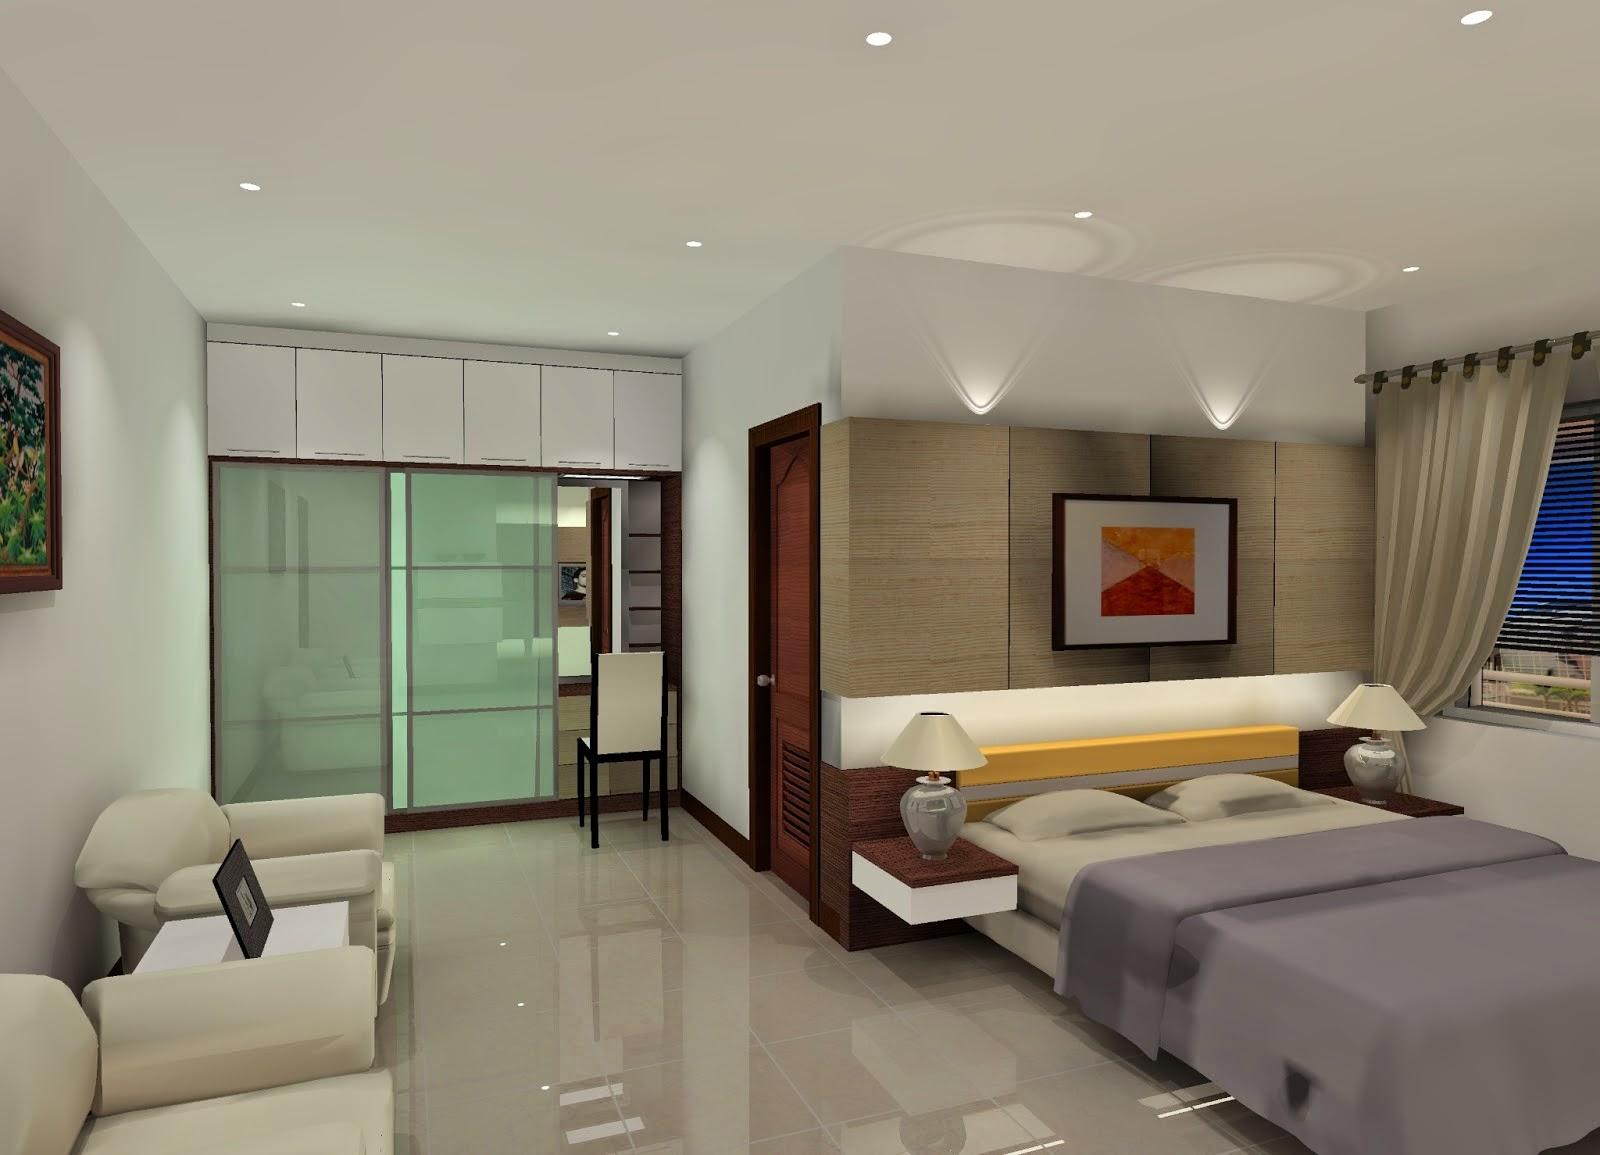 Desain-interior-kamar-tidur-feminin